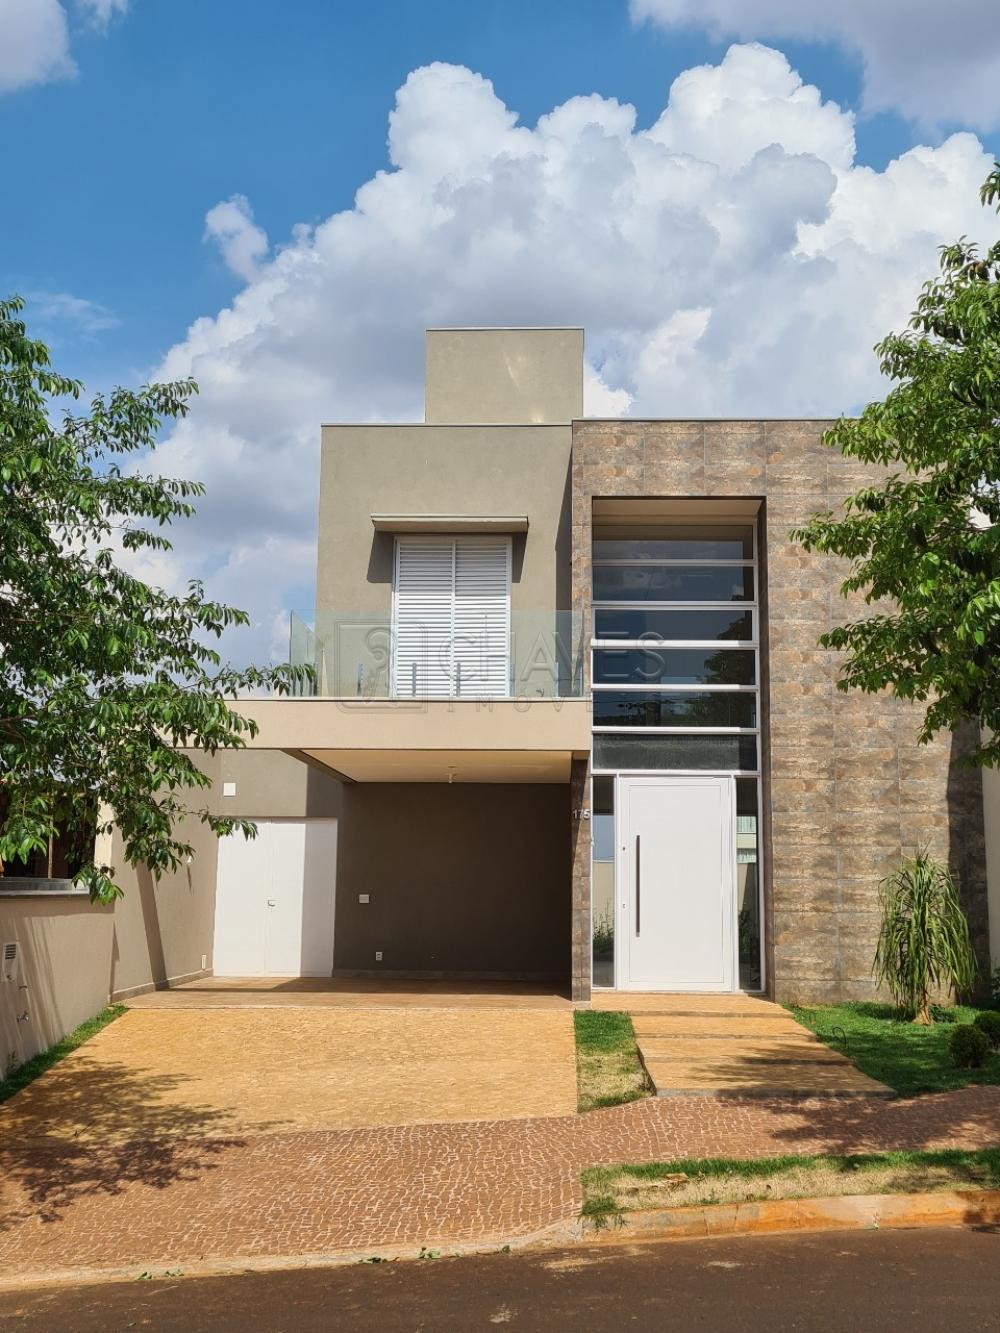 Ribeirao Preto Casa Venda R$850.000,00 Condominio R$270,00 3 Dormitorios 3 Suites Area do terreno 250.00m2 Area construida 180.00m2